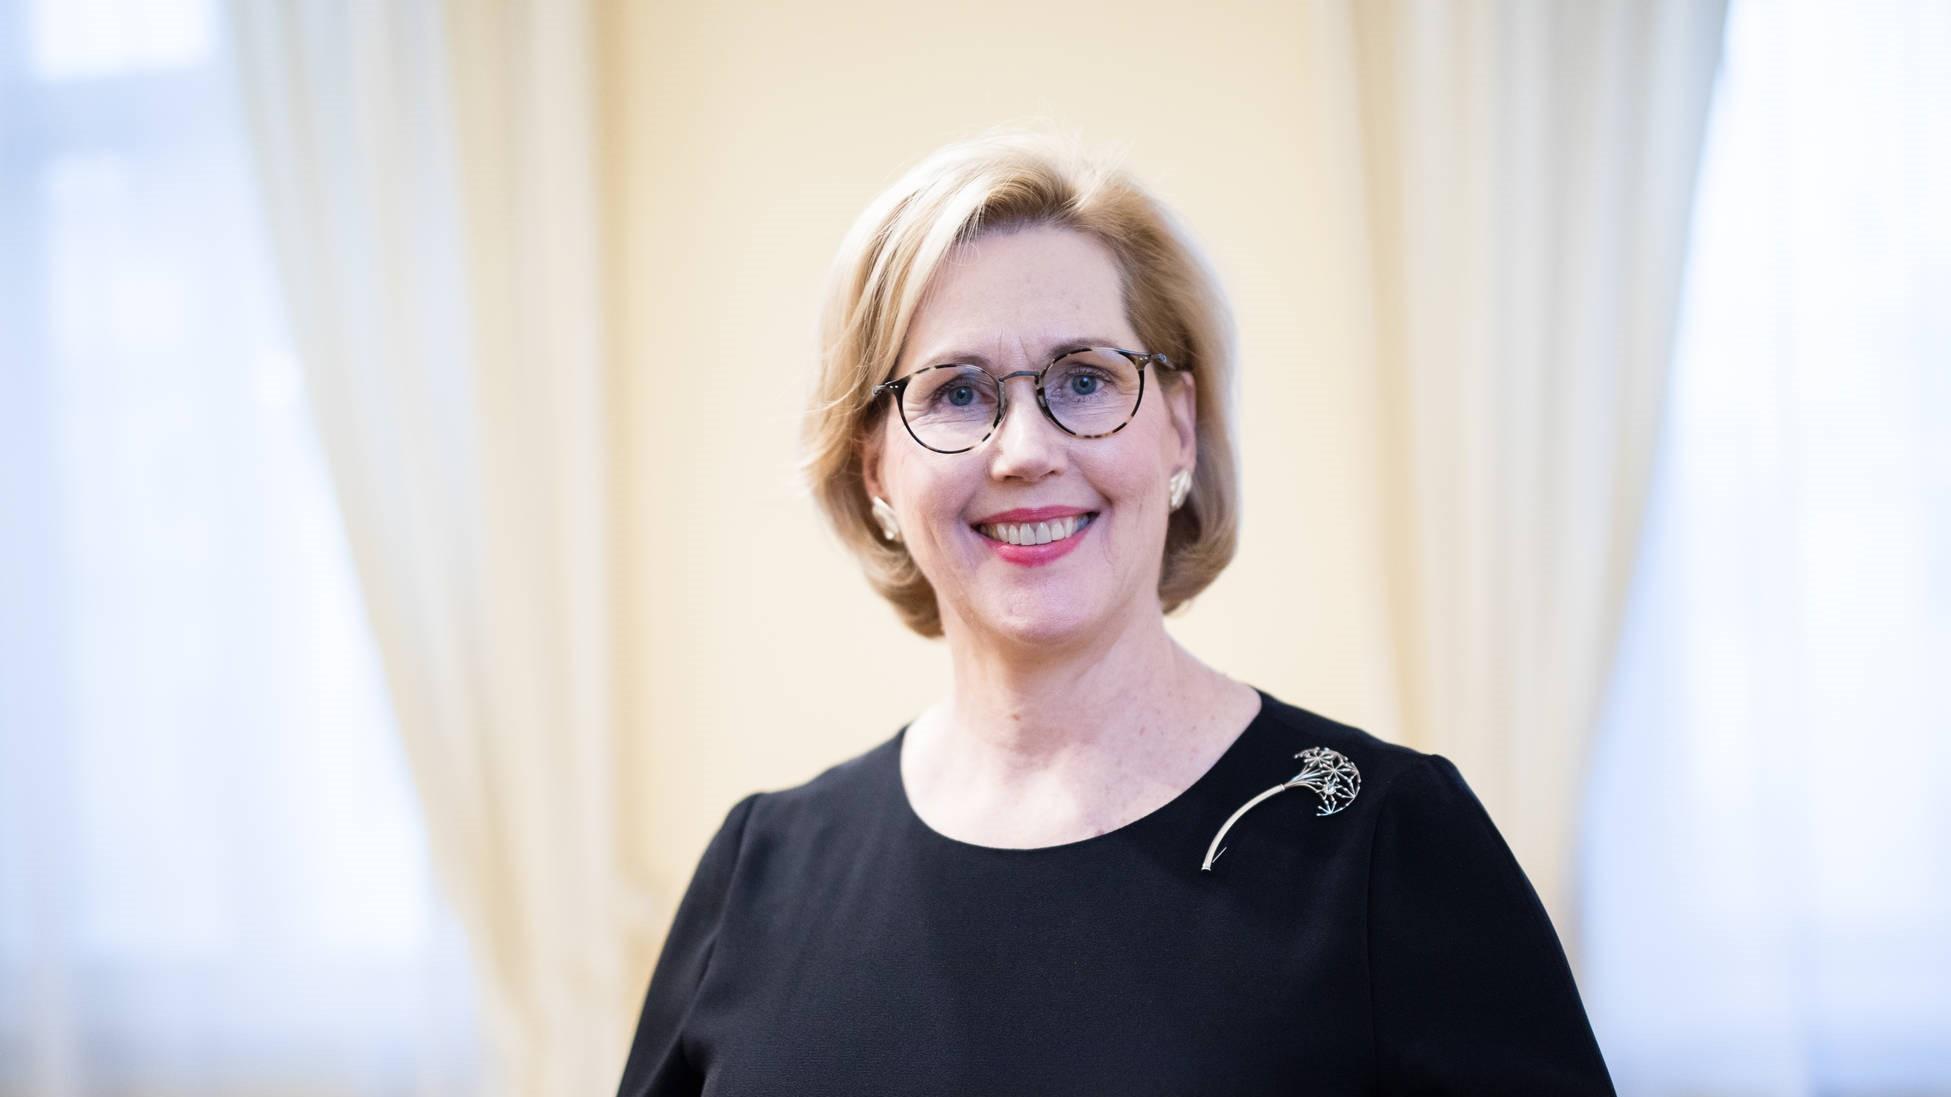 Tuula Haatainen new Finnish Minister of Employment